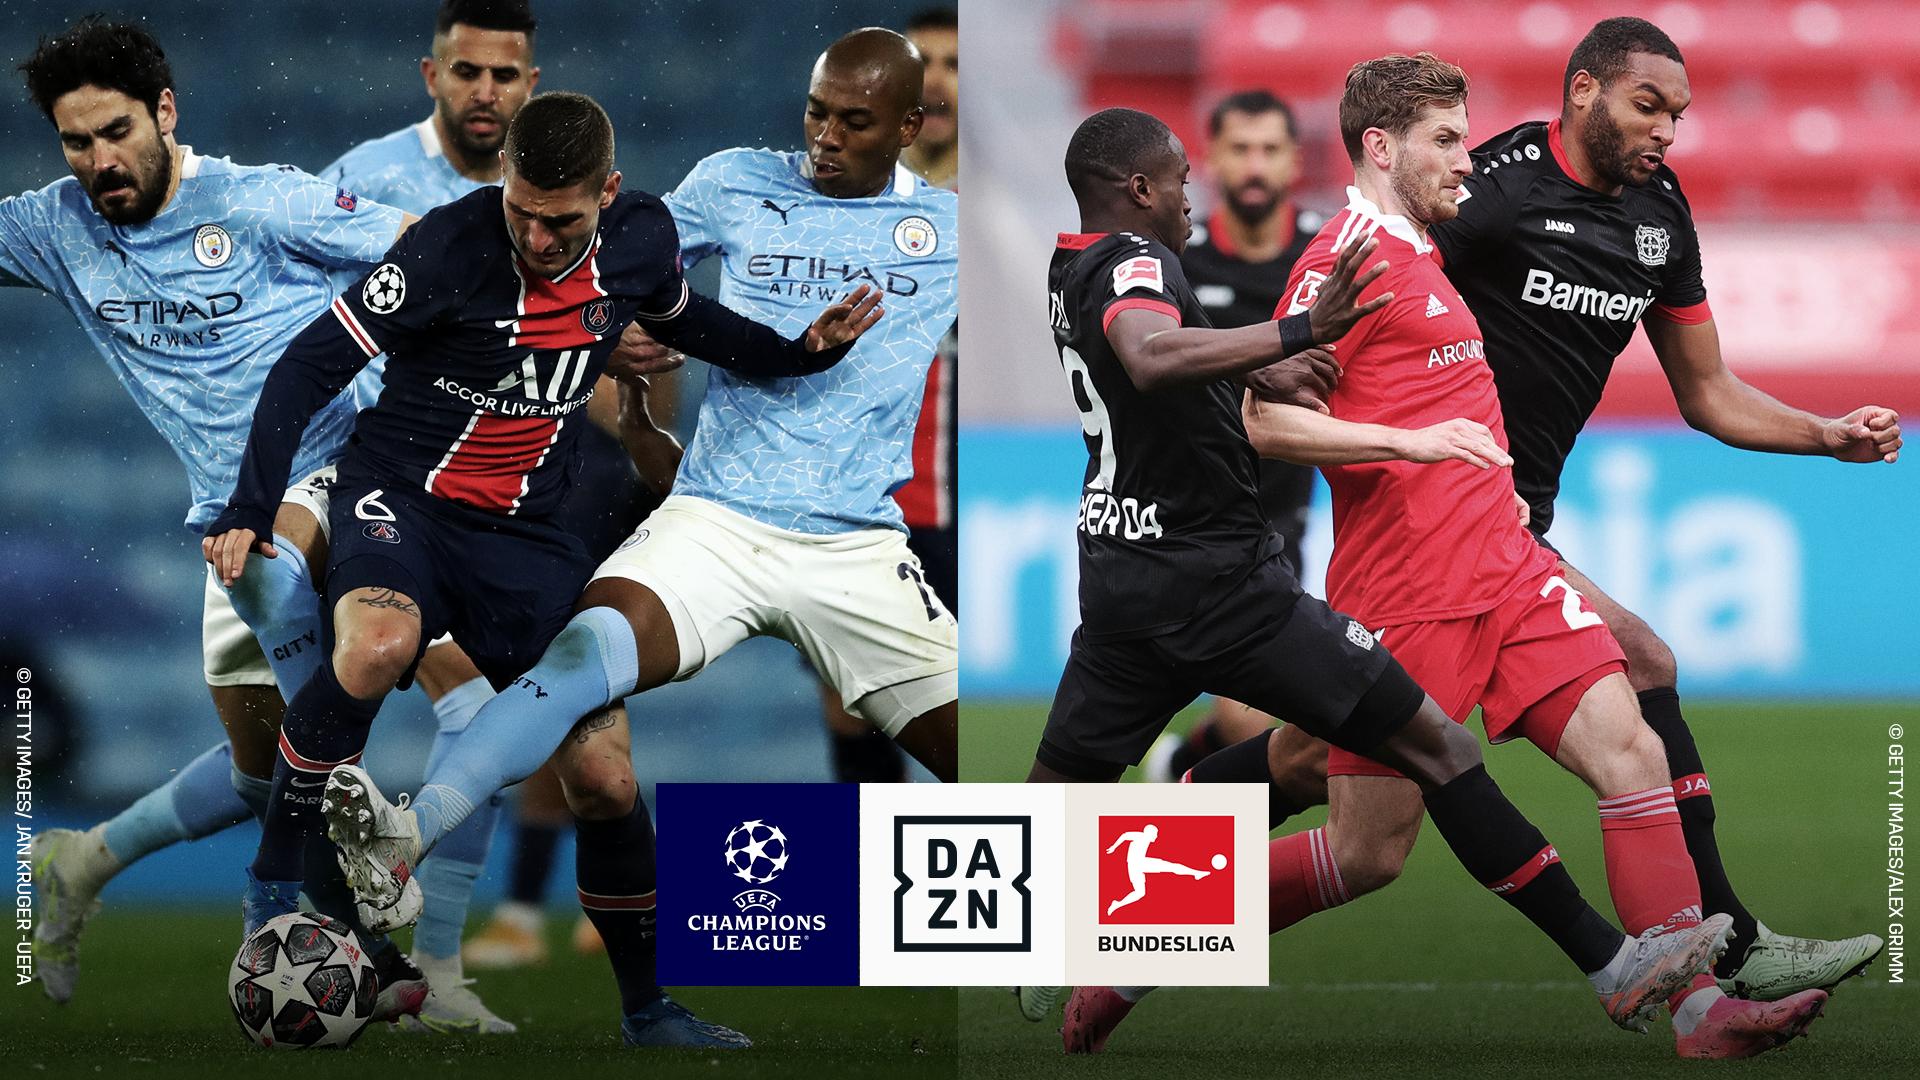 Spielszenen aus zwei Matches der UEFA Champions League.